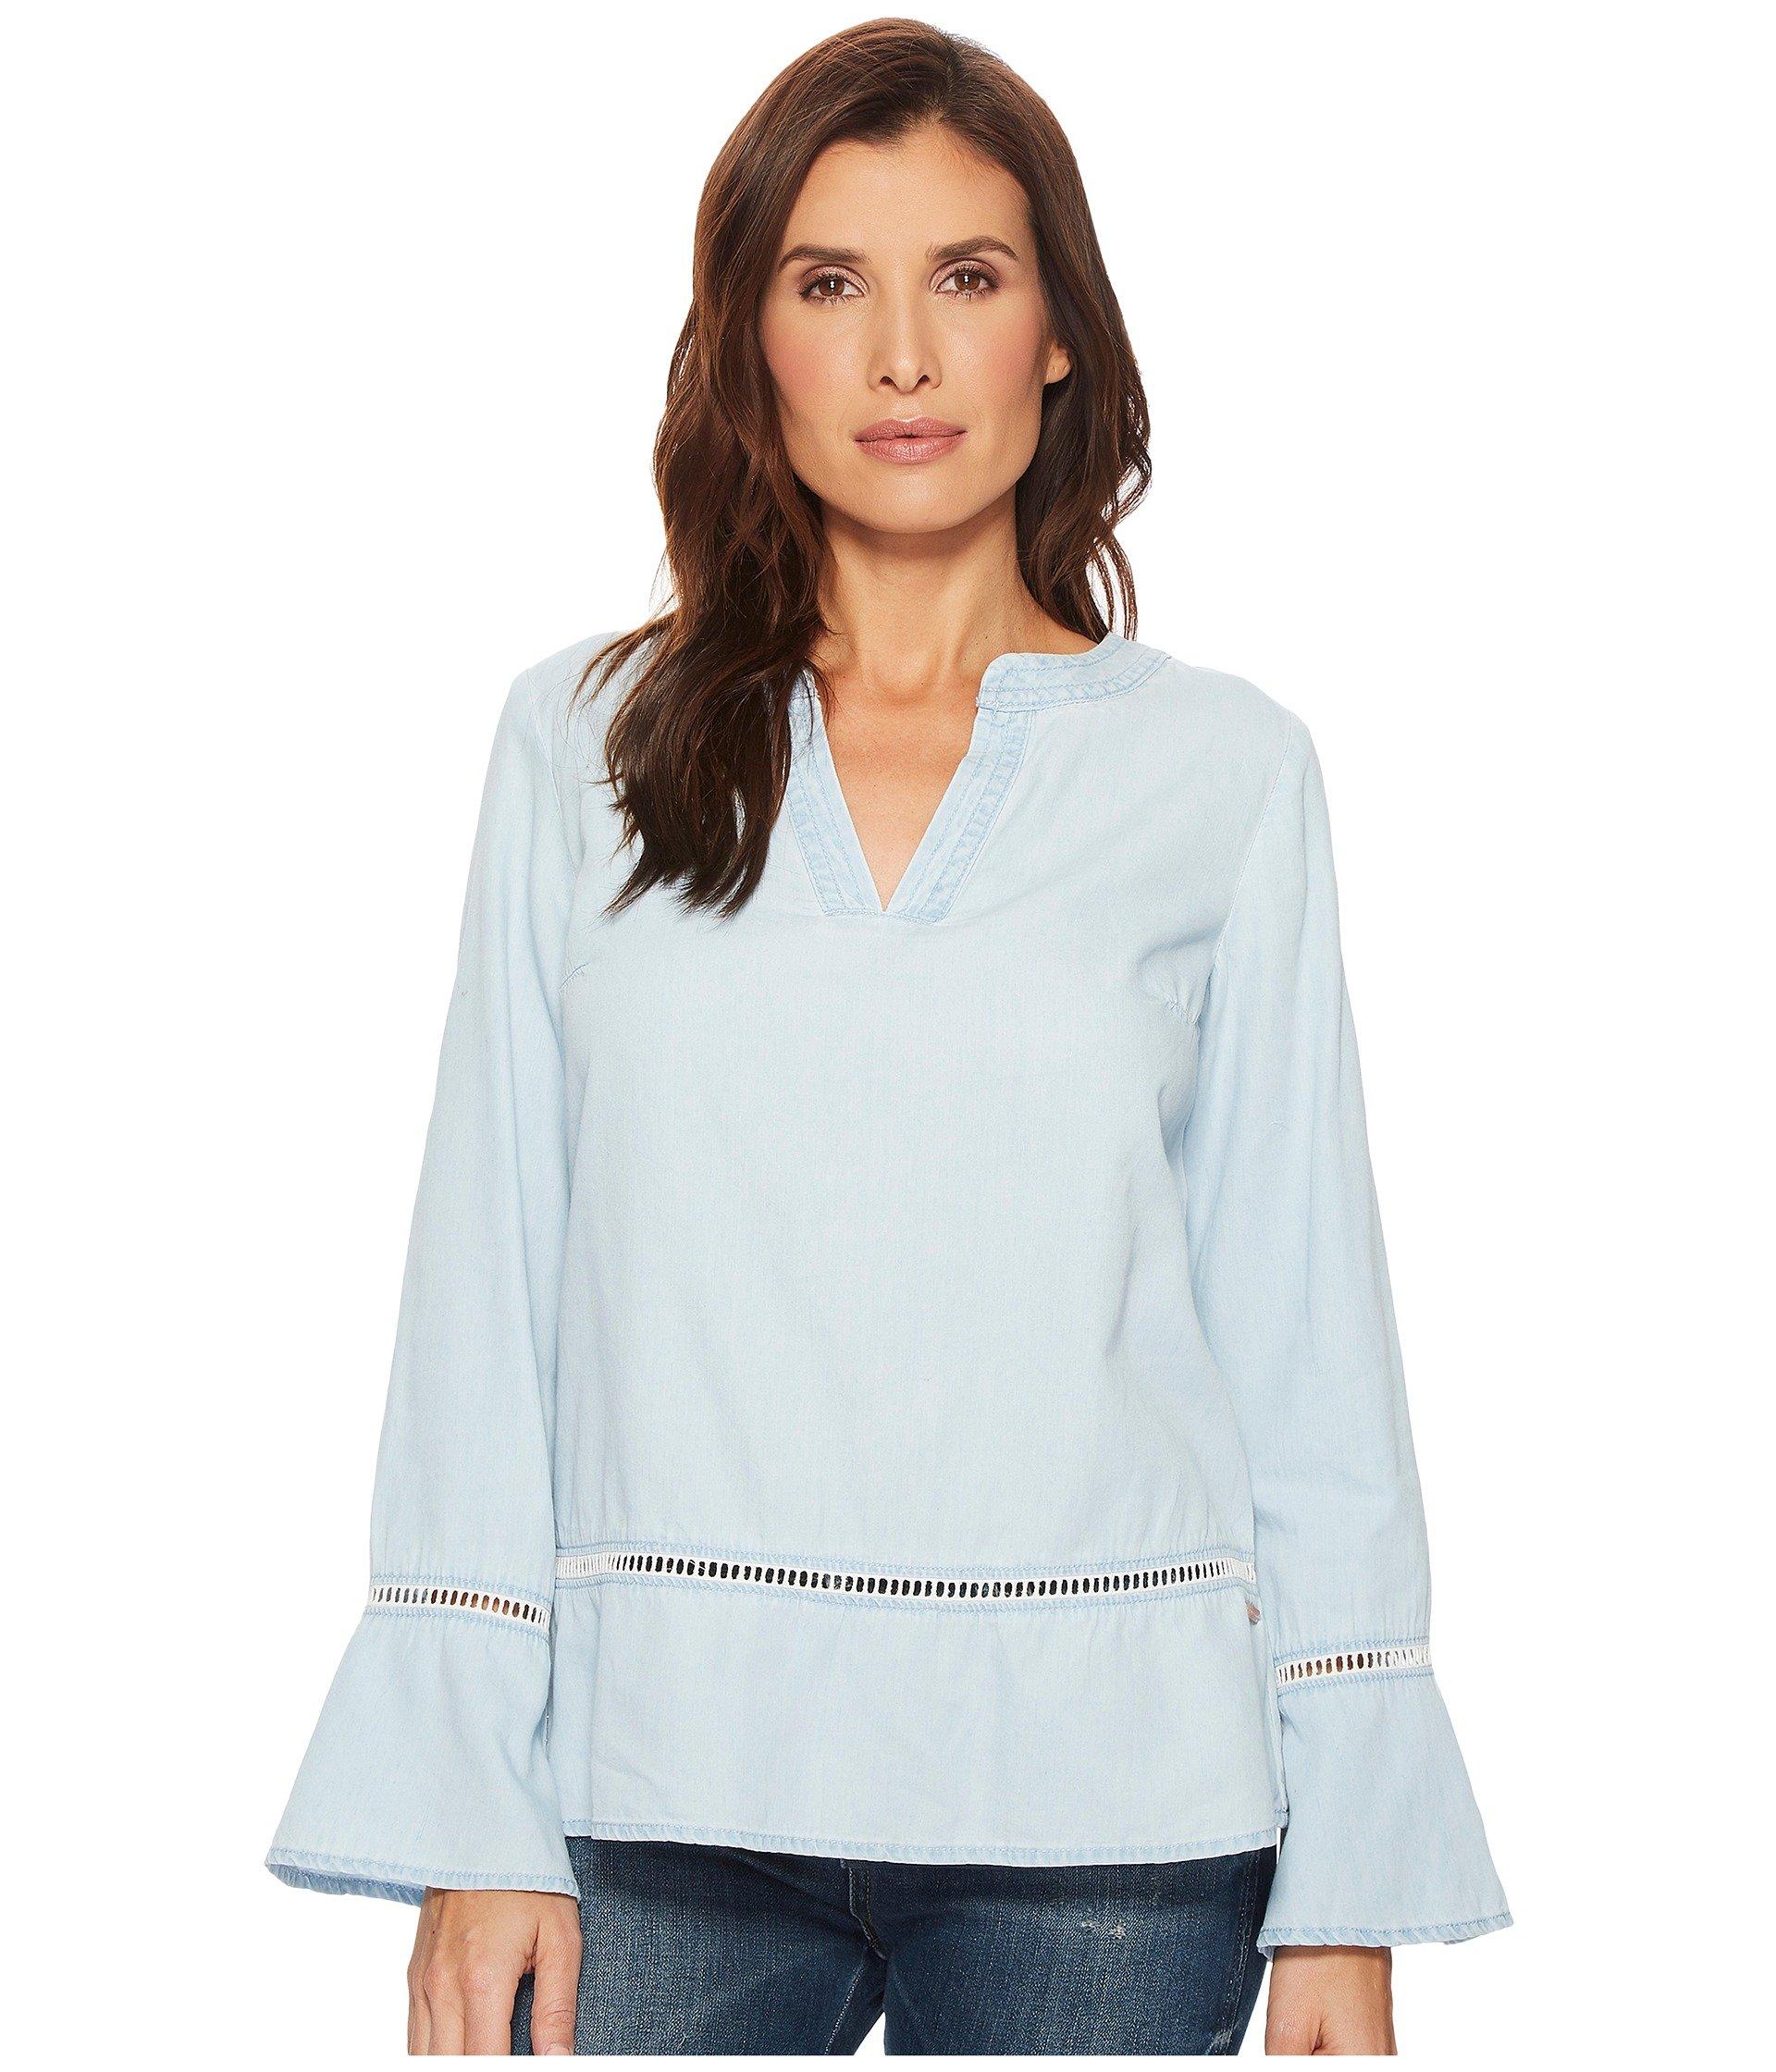 Blusa para Mujer U.S. POLO ASSN. Bell Sleeve Shirt  + U.S. POLO ASSN. en VeoyCompro.net